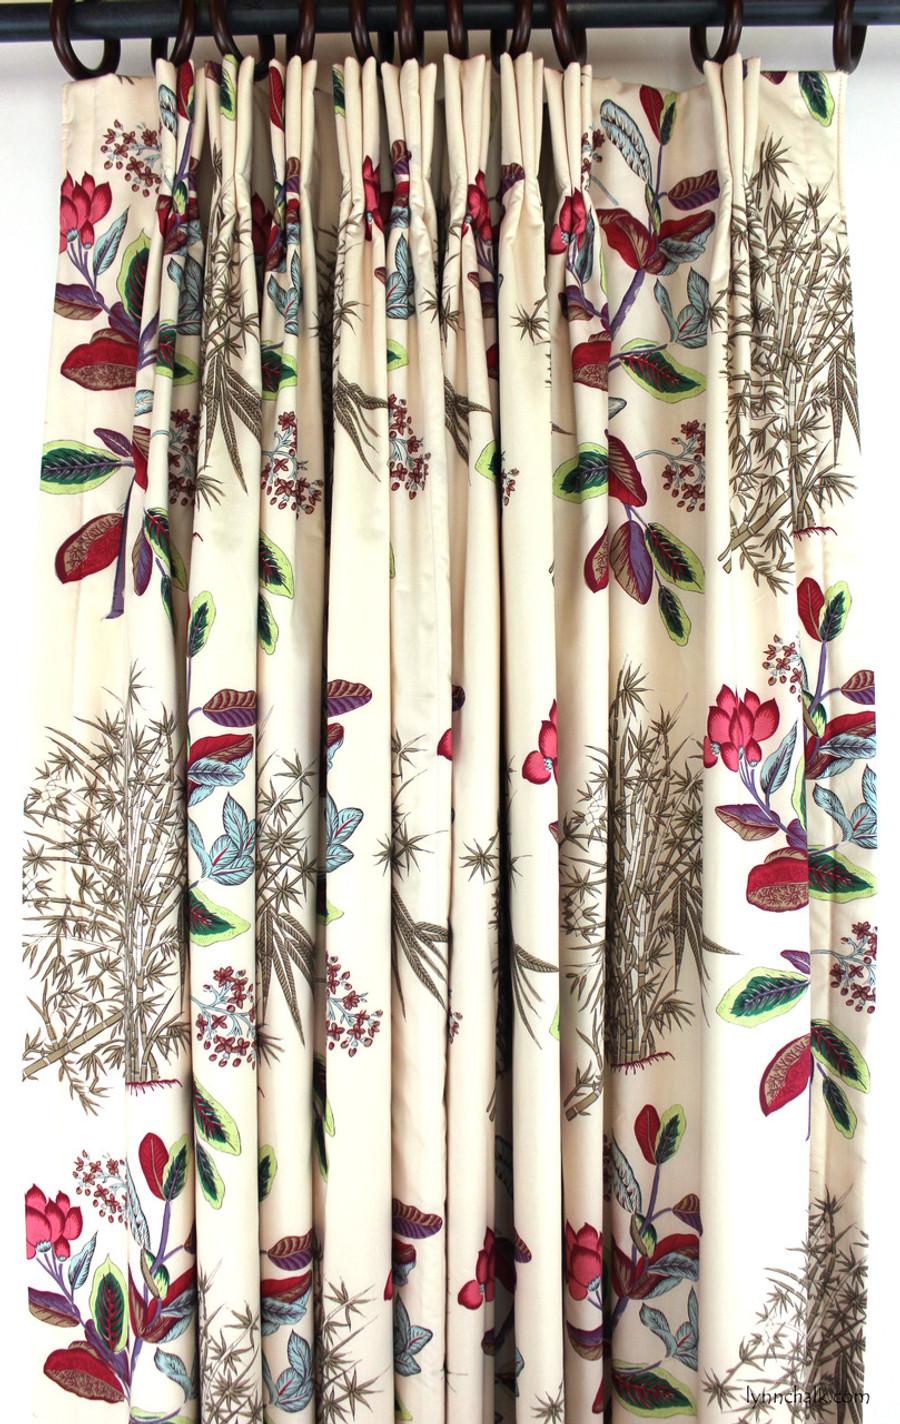 Quadrille Jardin Des Plantes Multi Custom Drapes Lined and Interlined